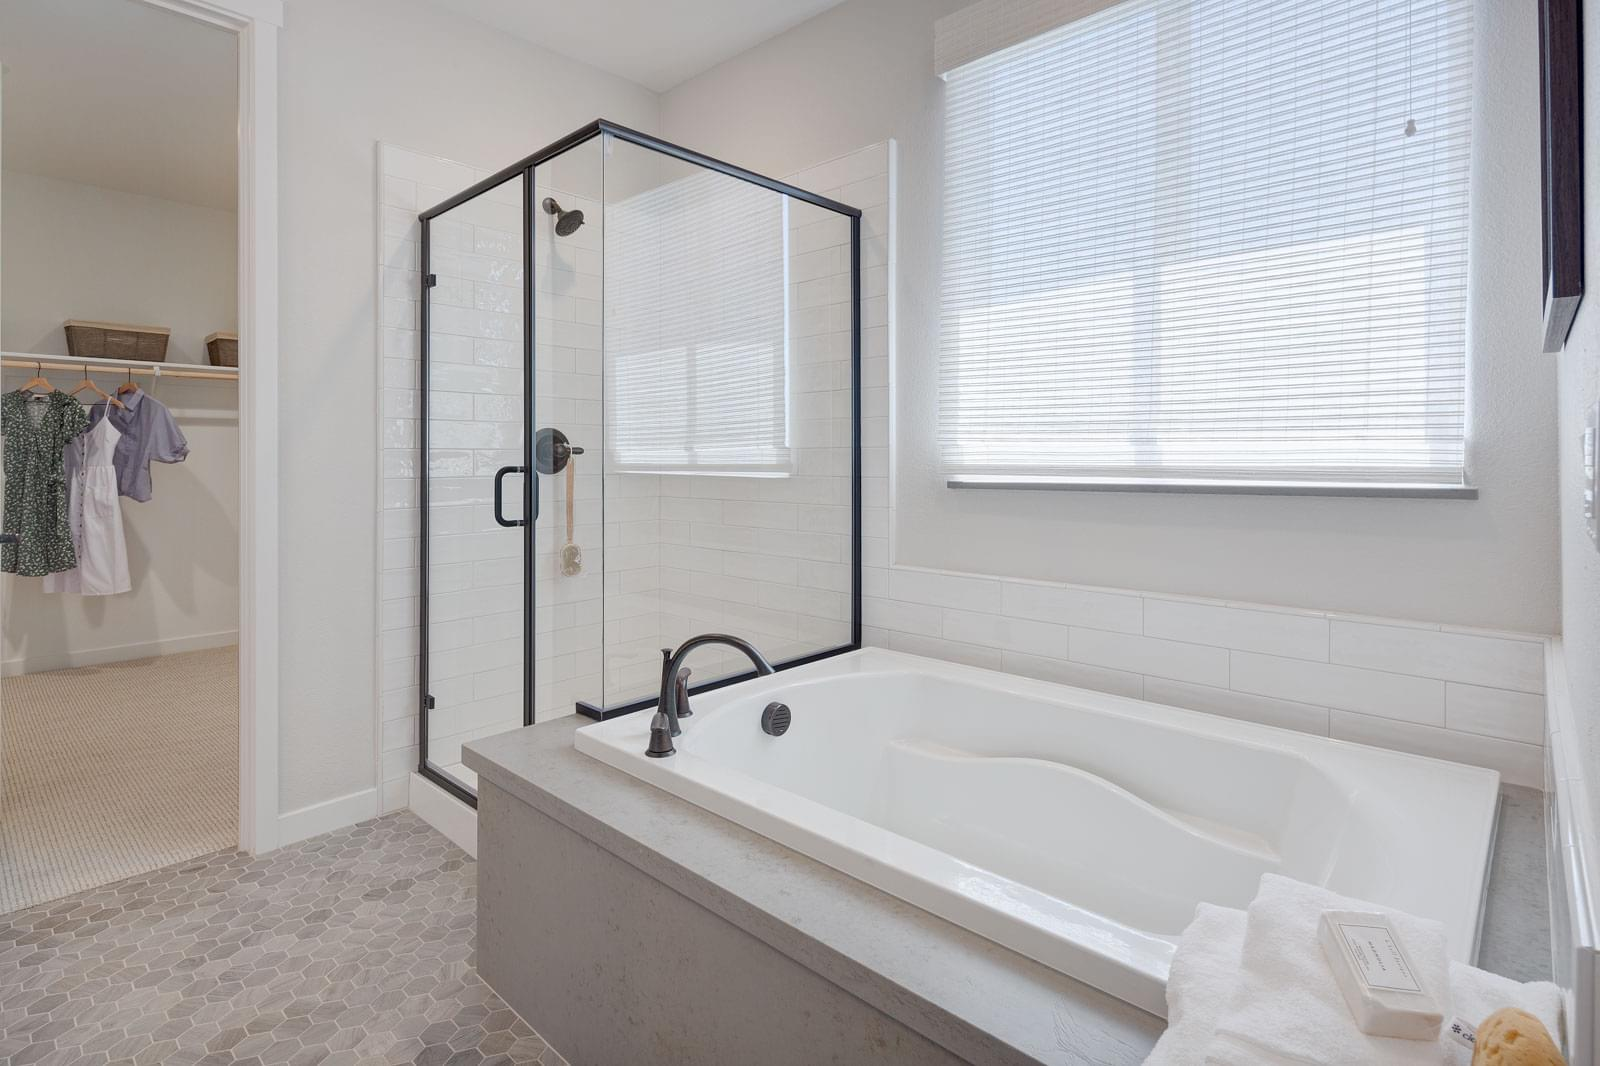 Residence 3 Owner's Bath